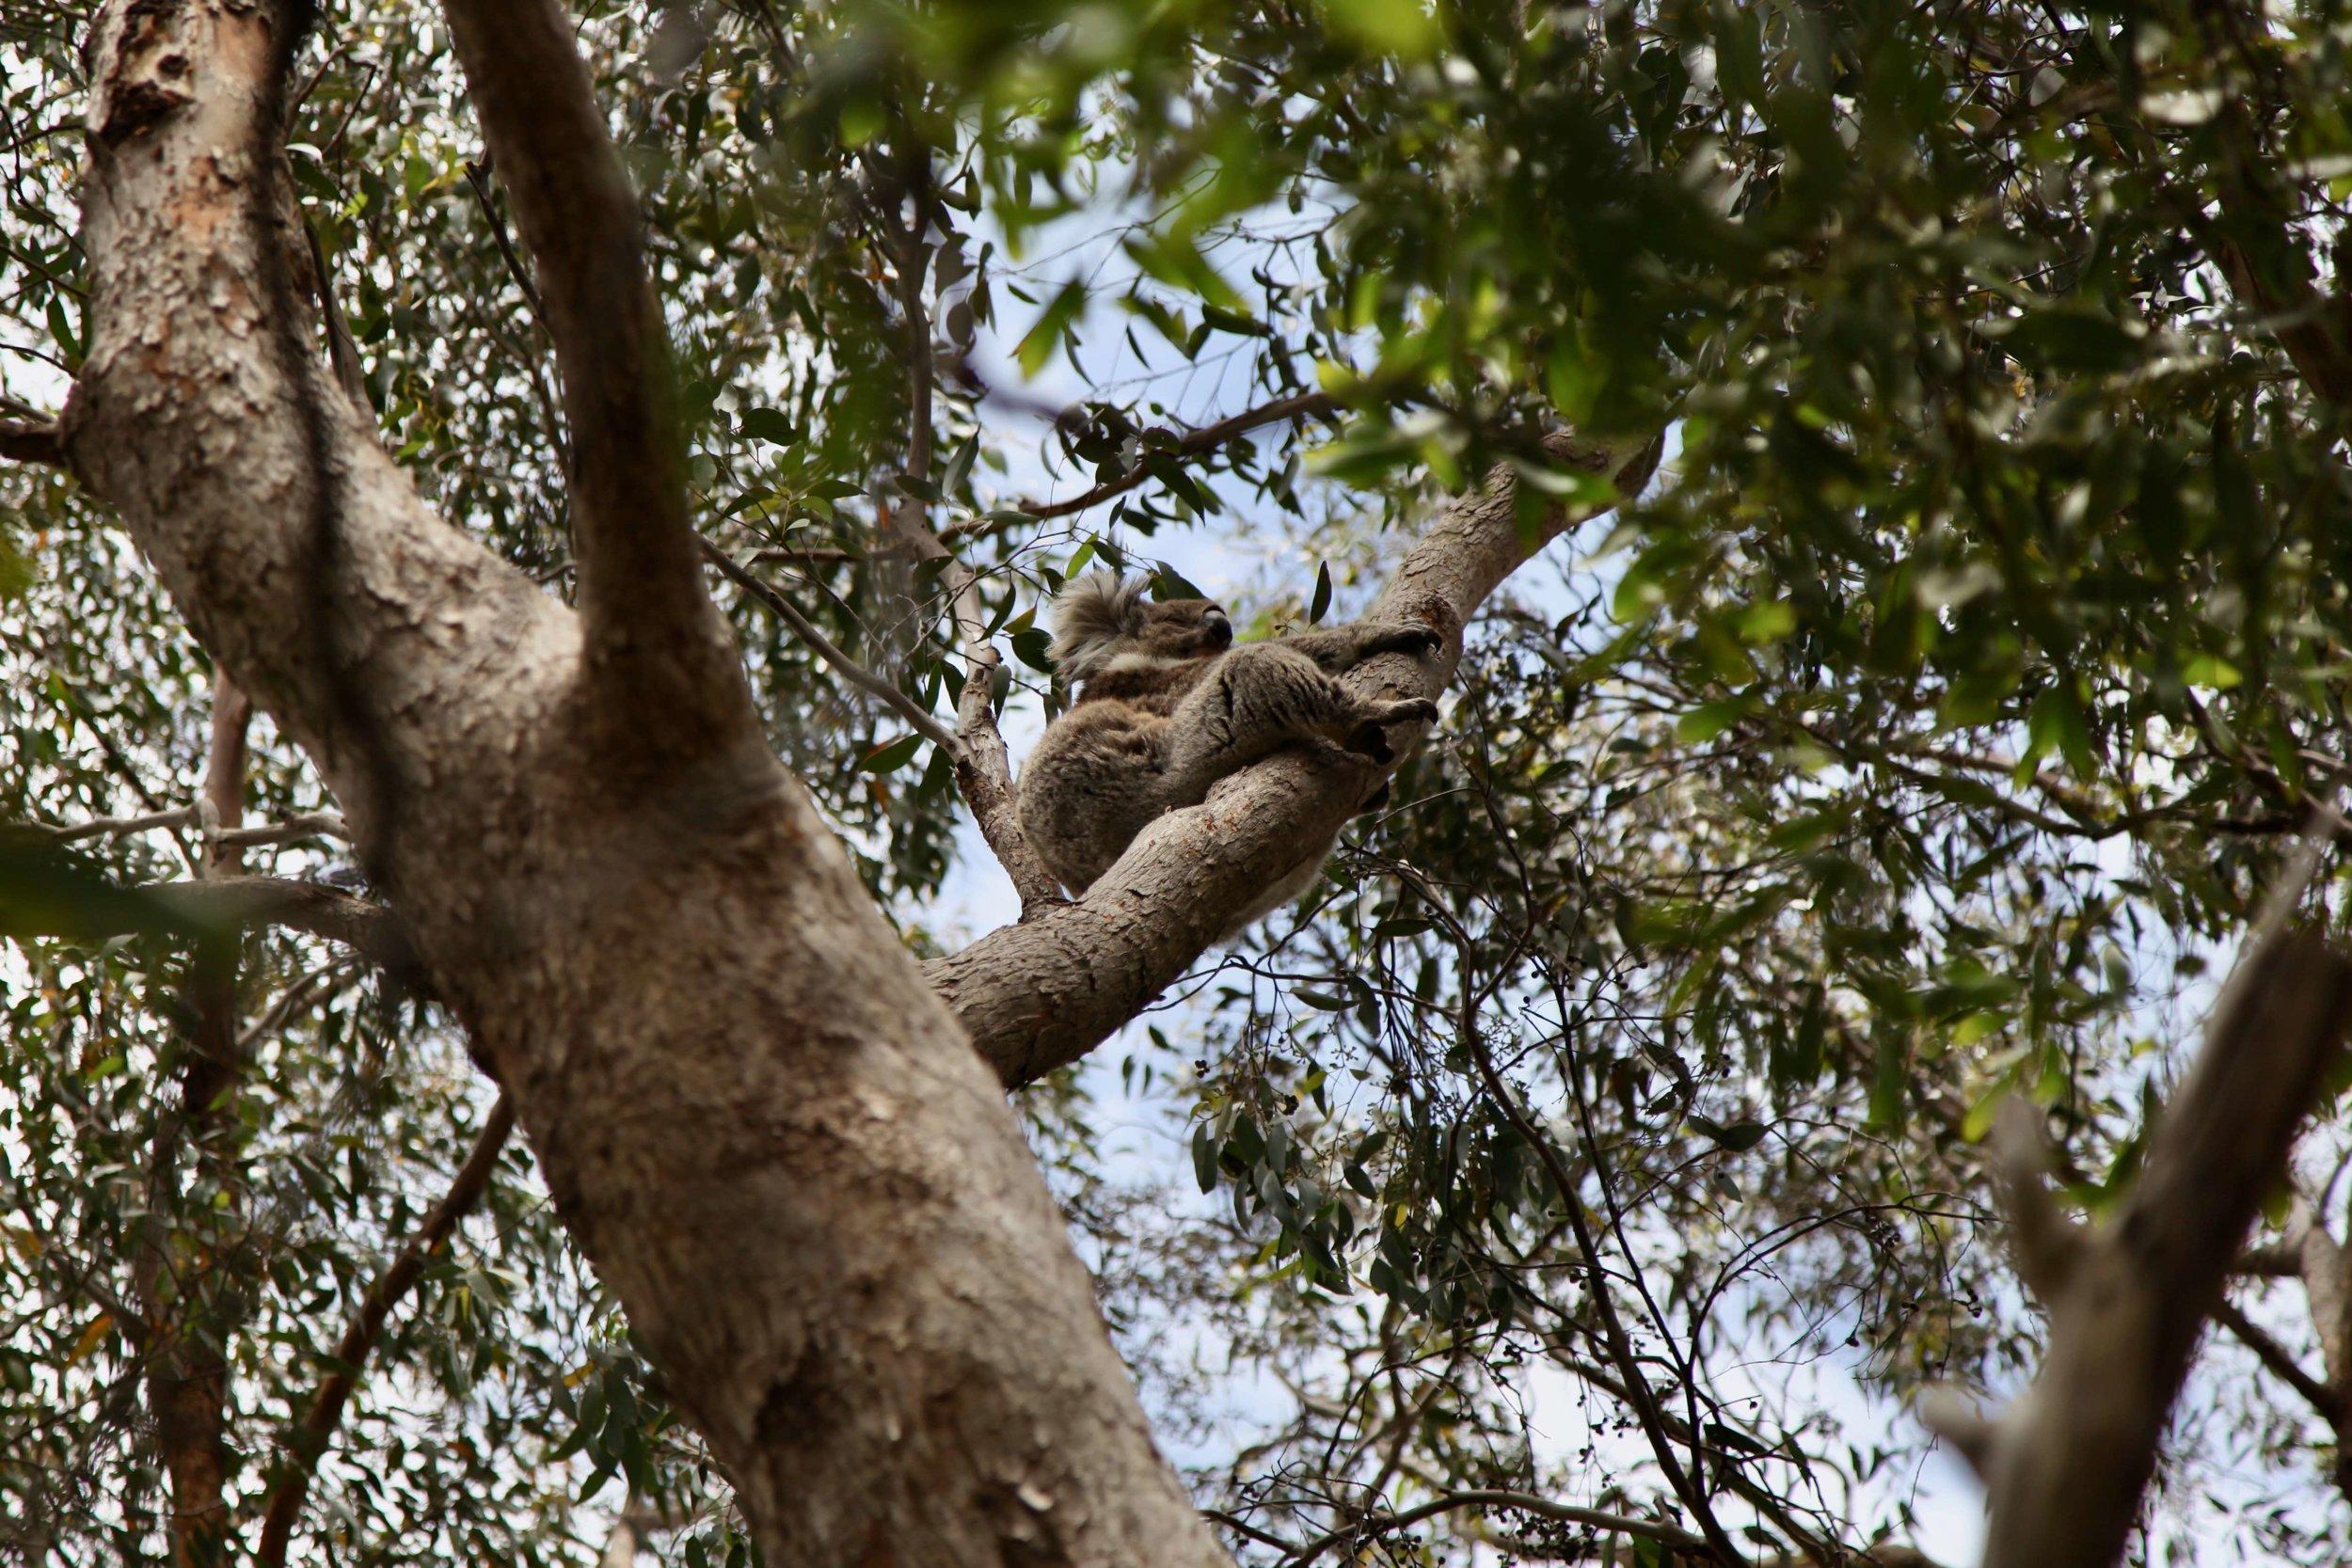 Koala in the trees on Mount Lofty near the summit.